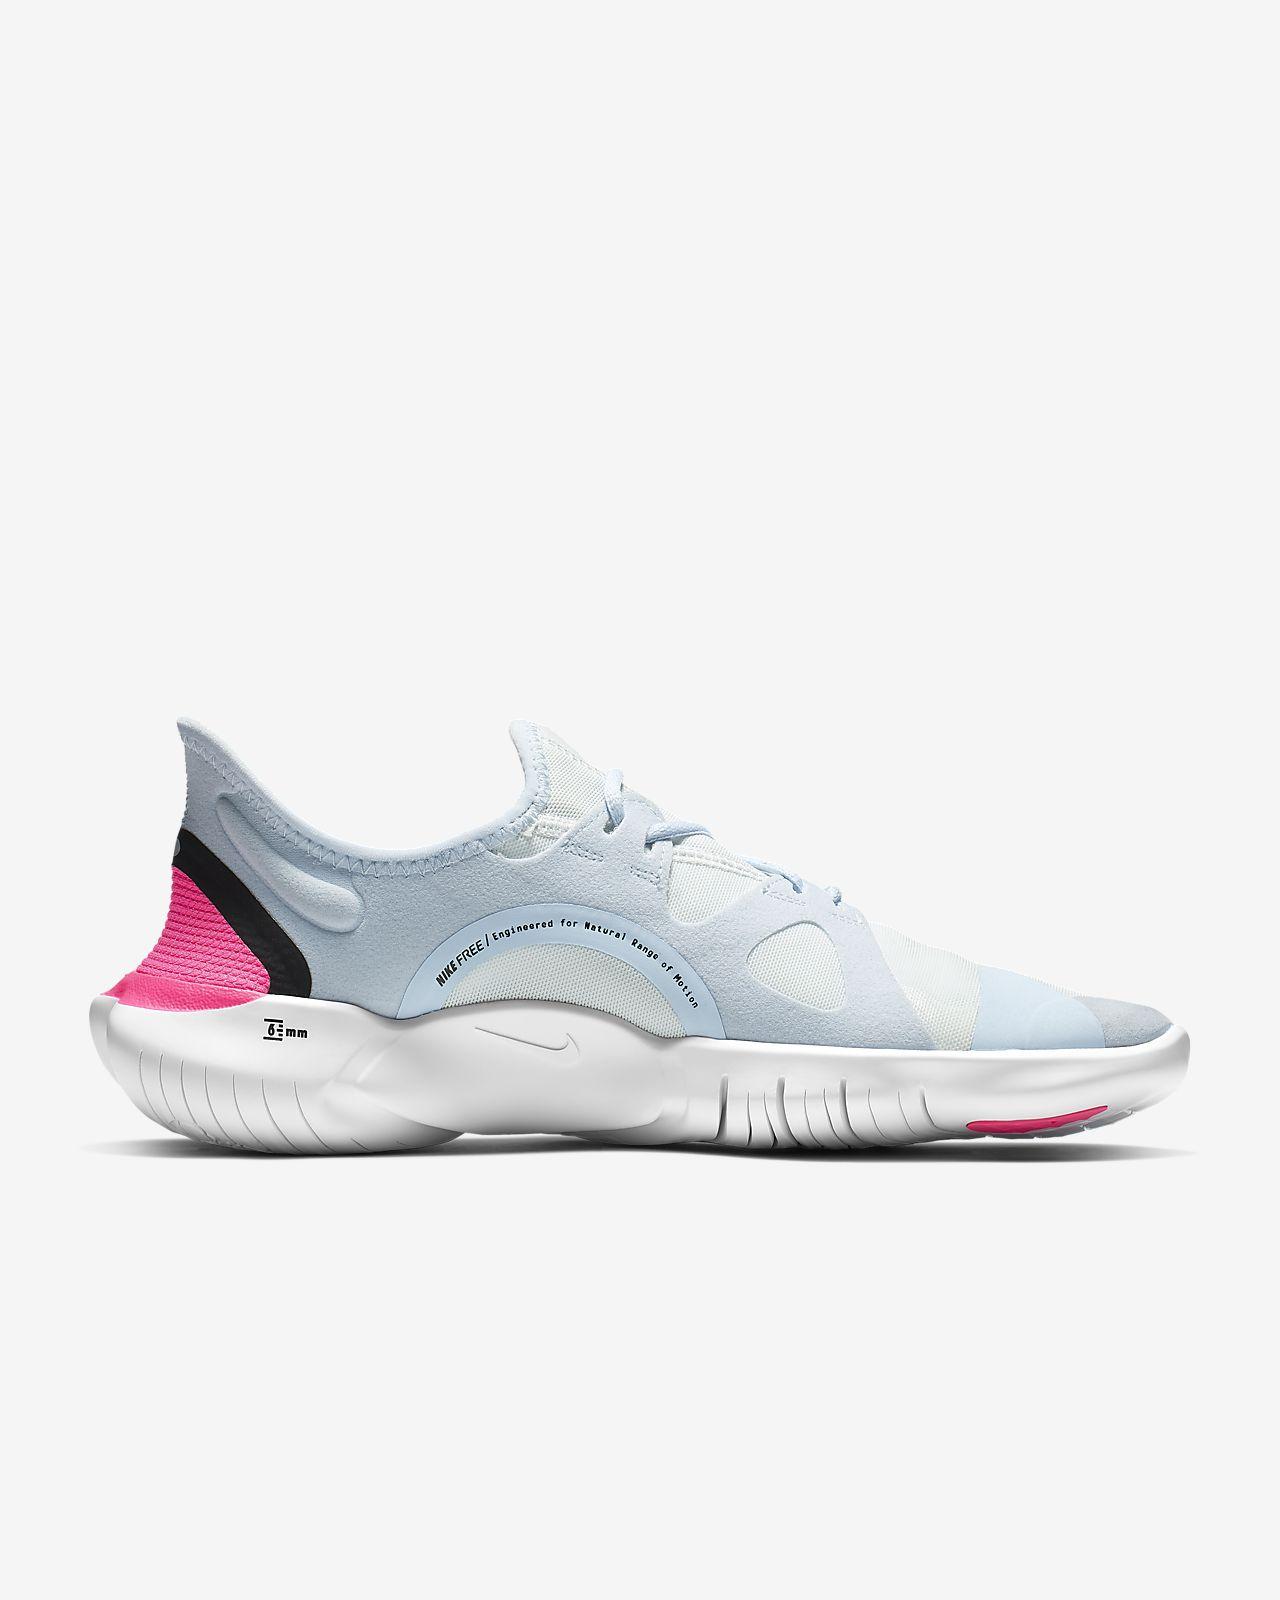 best sneakers d9473 f379e ... Chaussure de running Nike Free RN 5.0 pour Femme